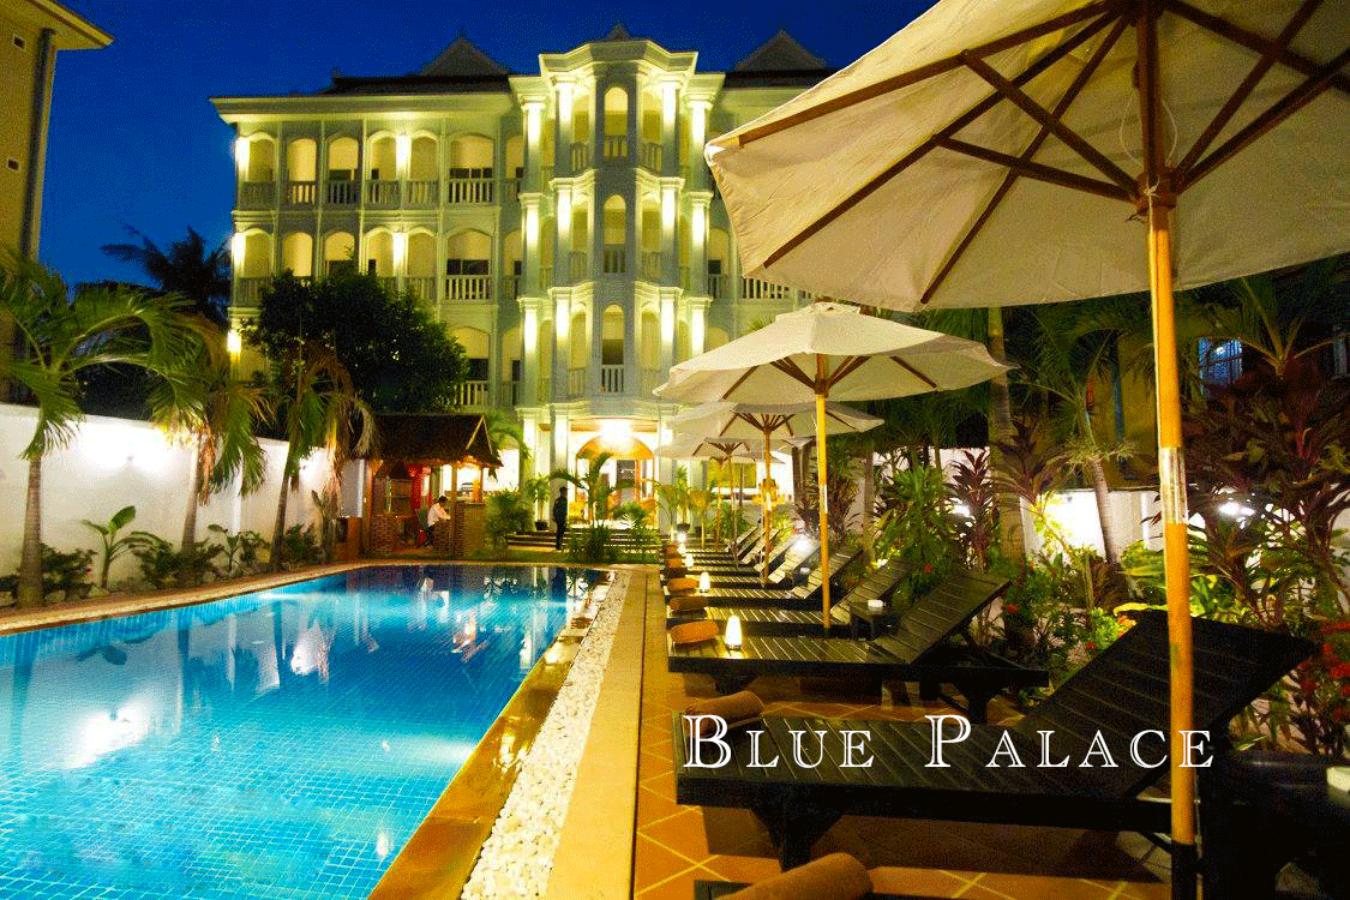 blue palace hotel siemreap